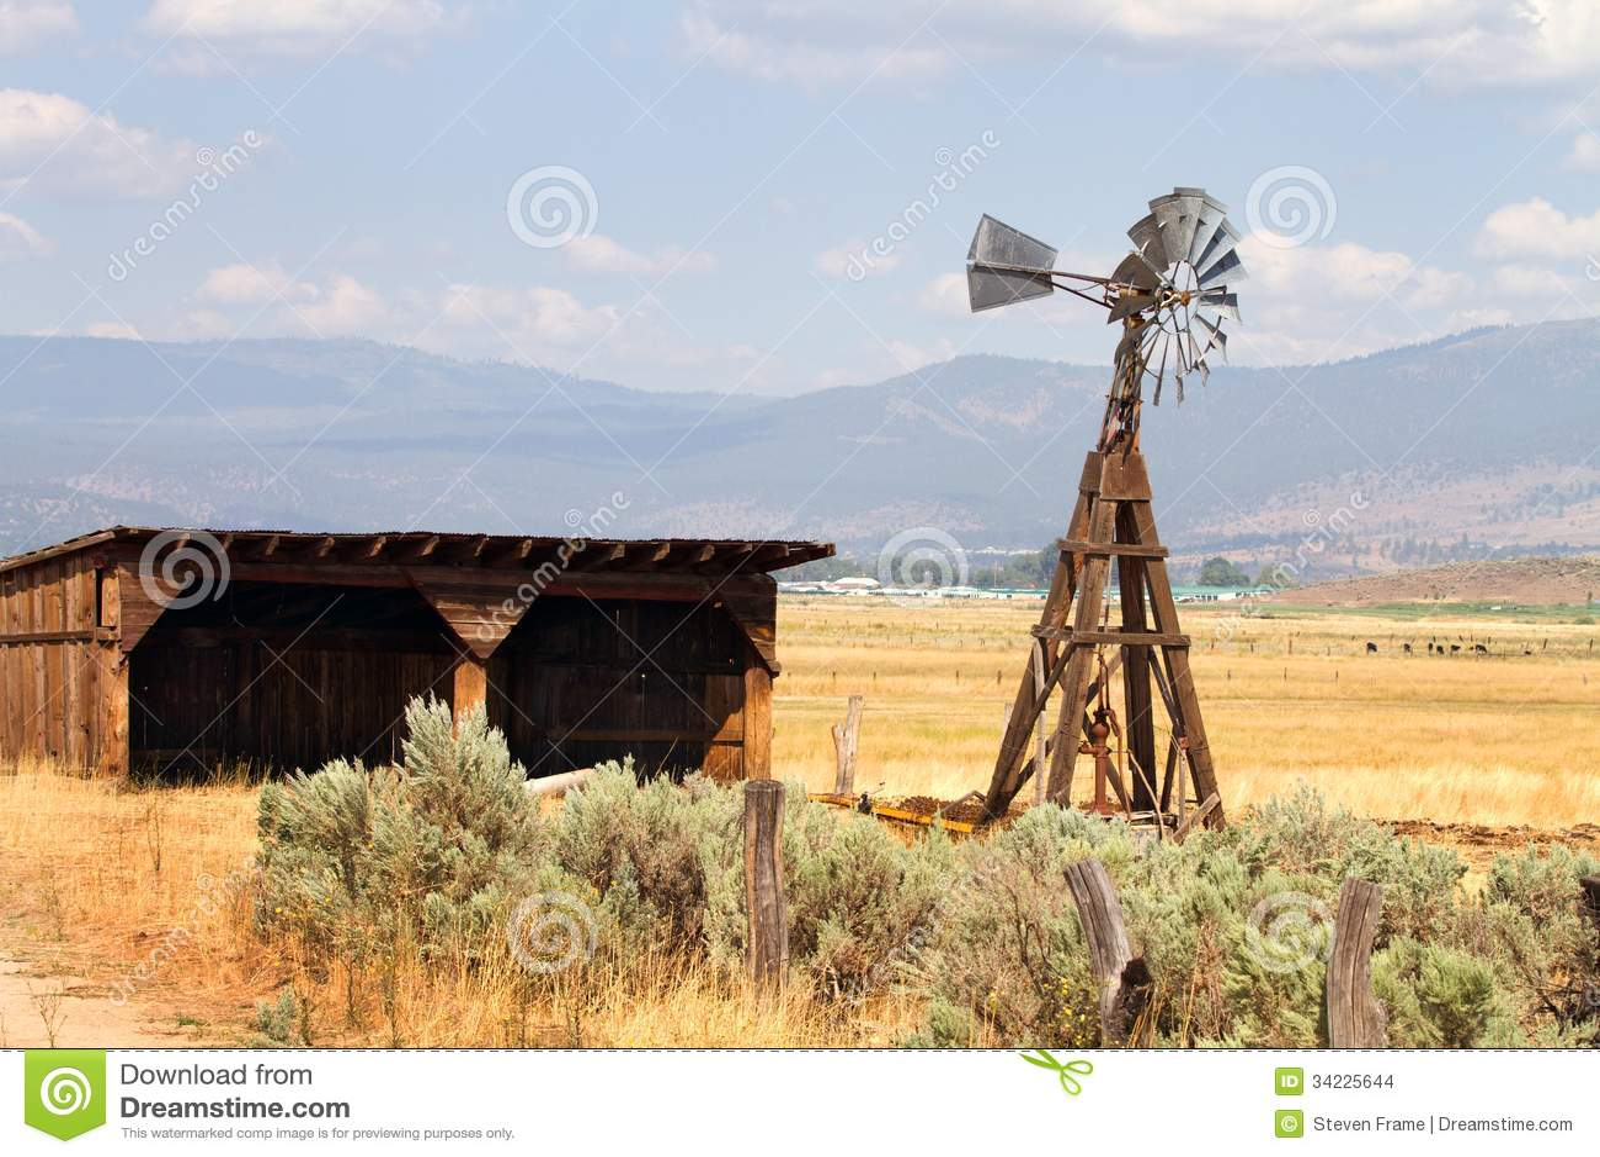 Water Pumping Windmill Stock Photo Image Of Irrigation